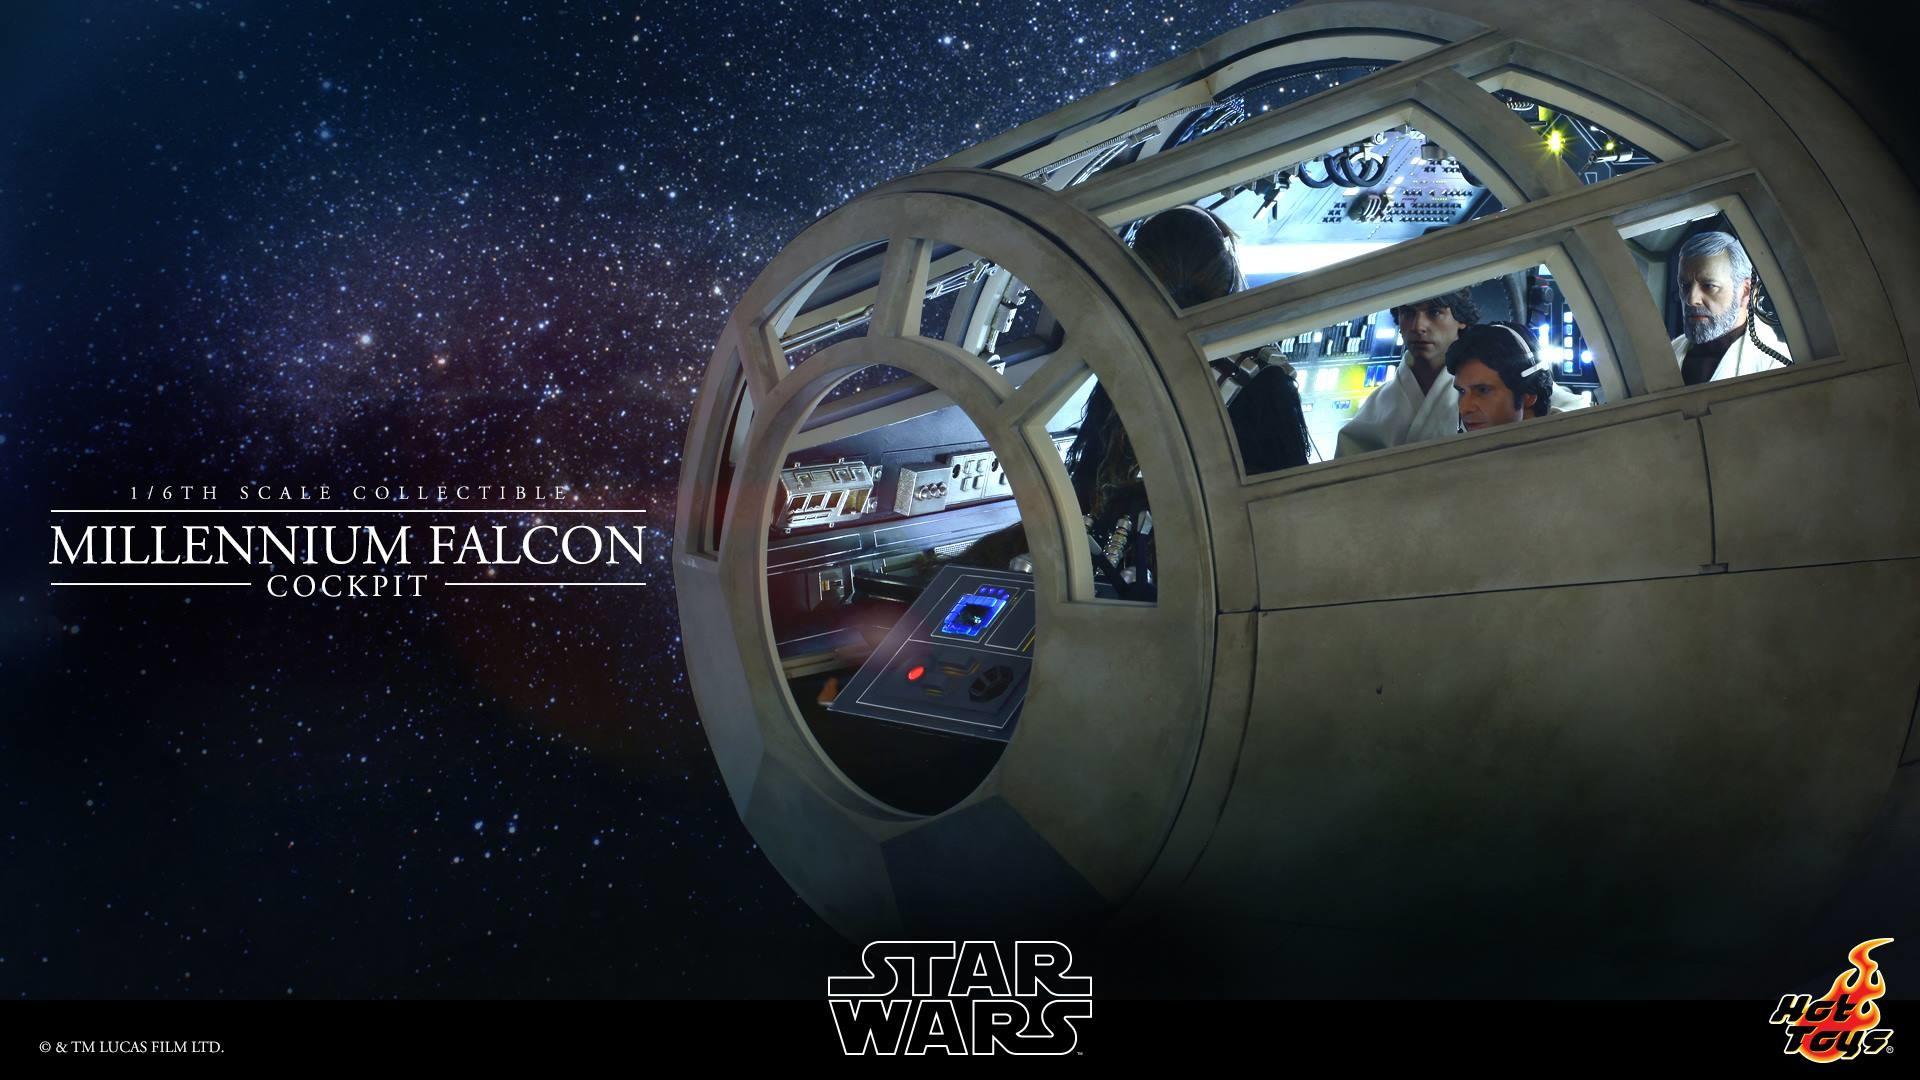 Millennium Falcon Hd Wallpaper 66 Images